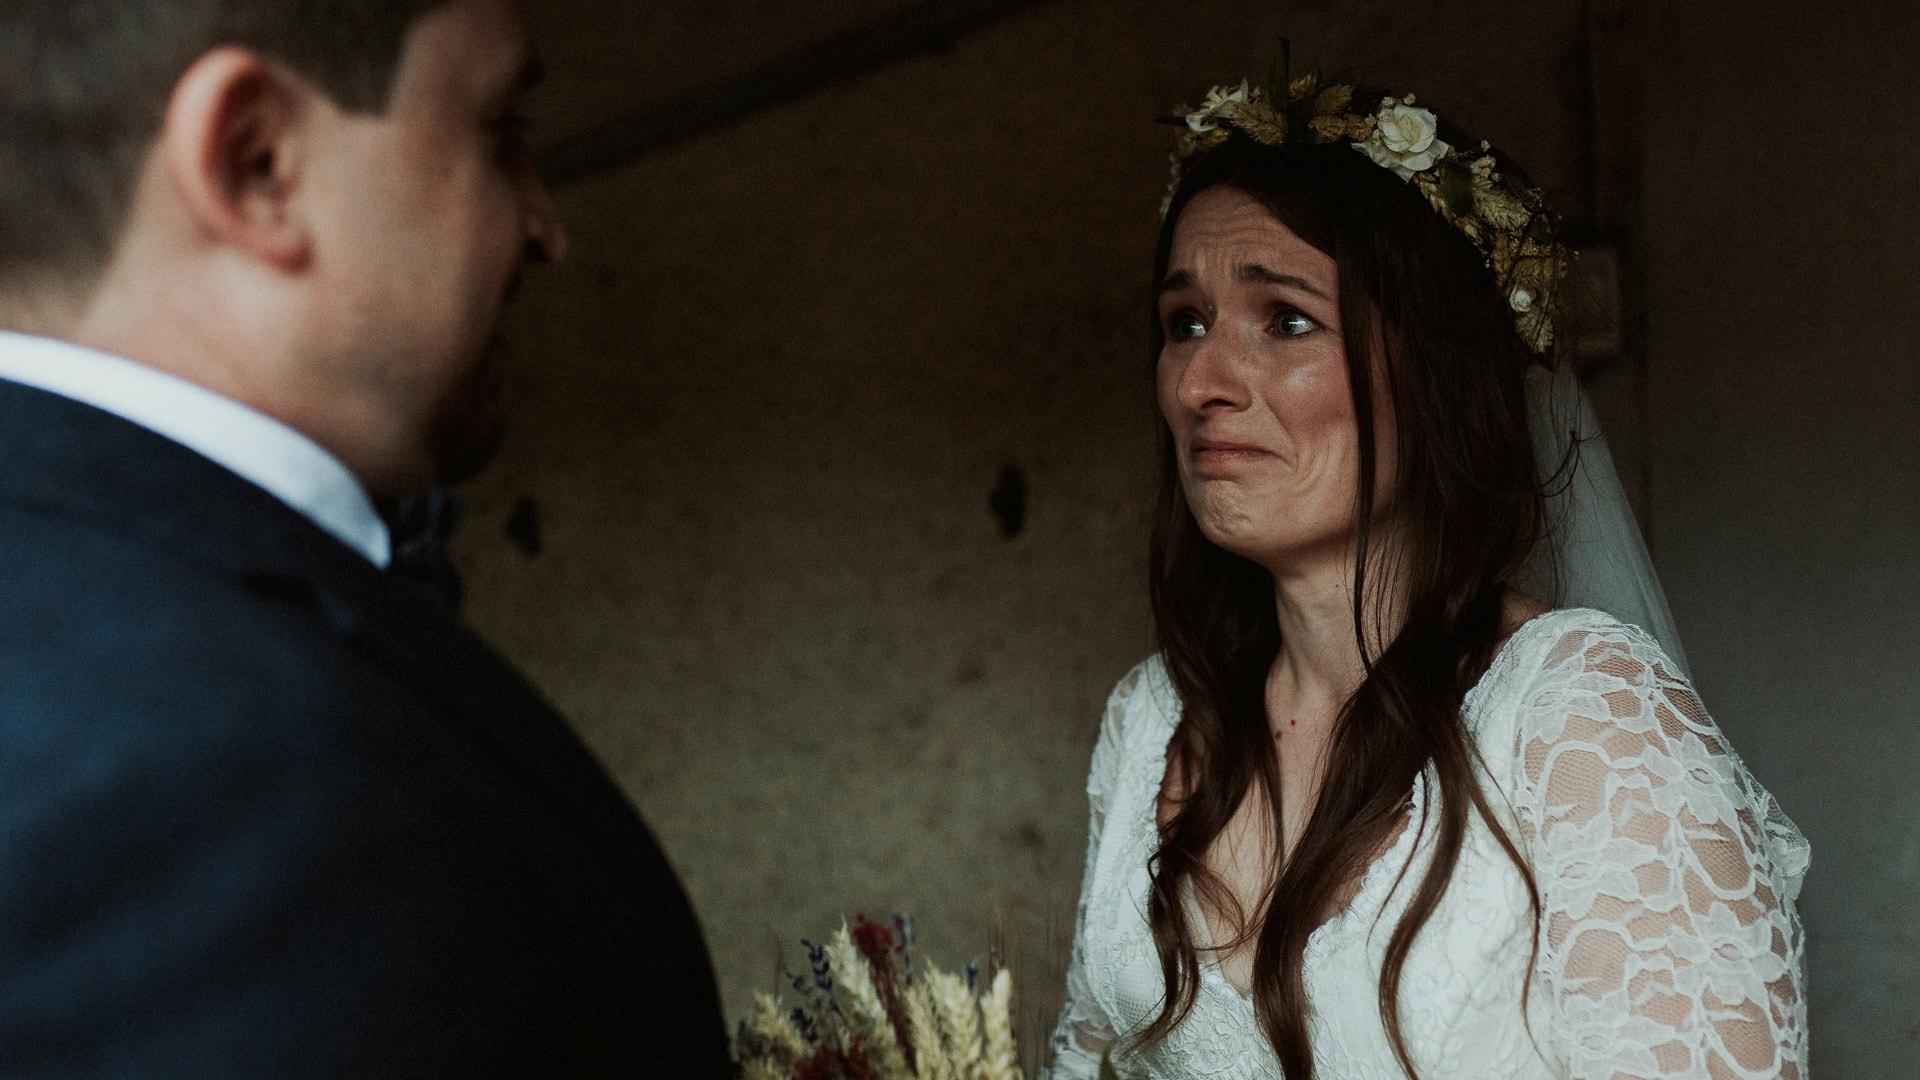 Edenbarn Wedding Photographer Lake District England 0003